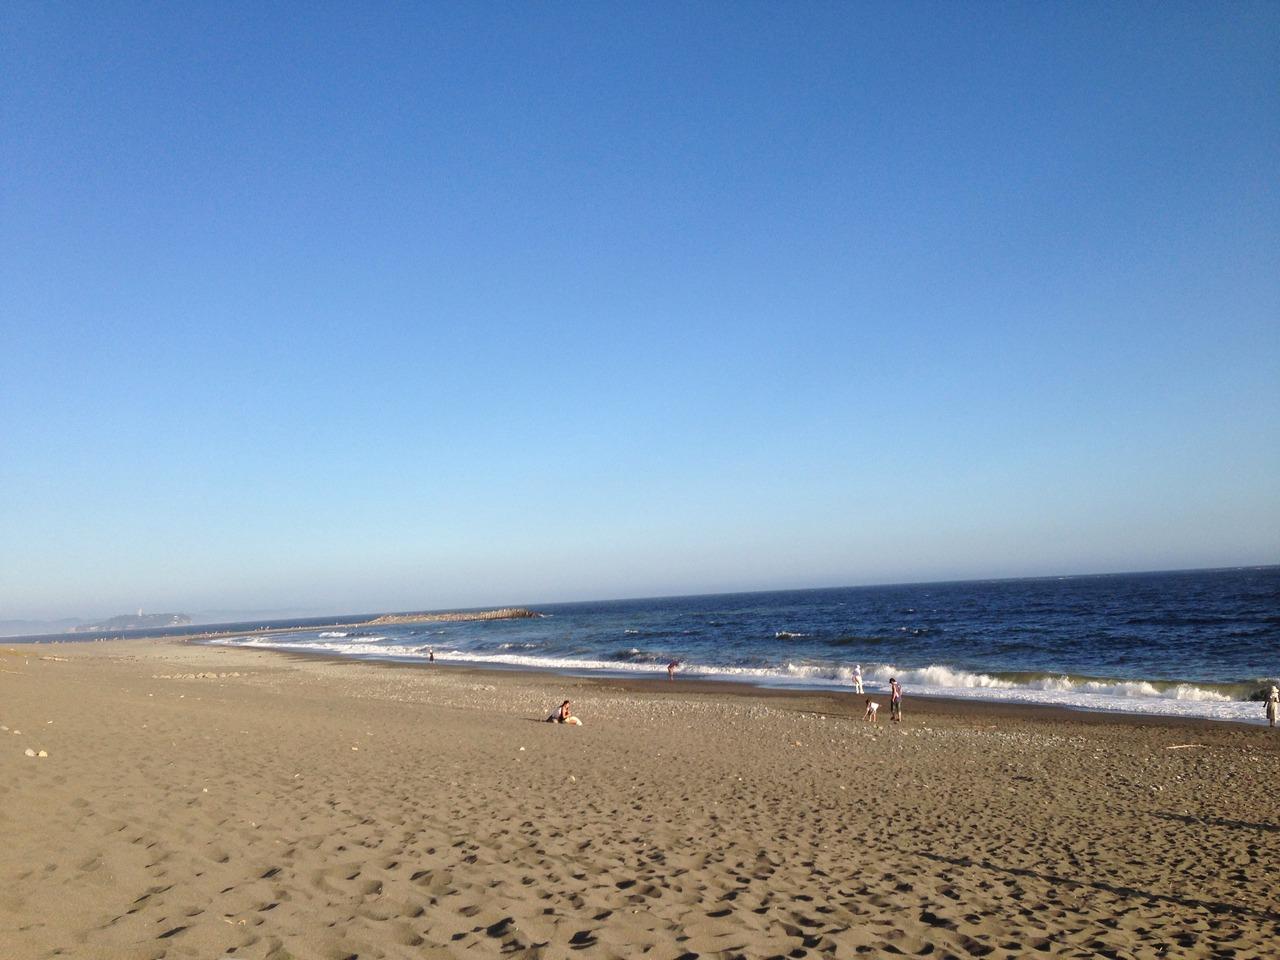 湘南,江ノ島,ビーチ,海水浴,海,画像